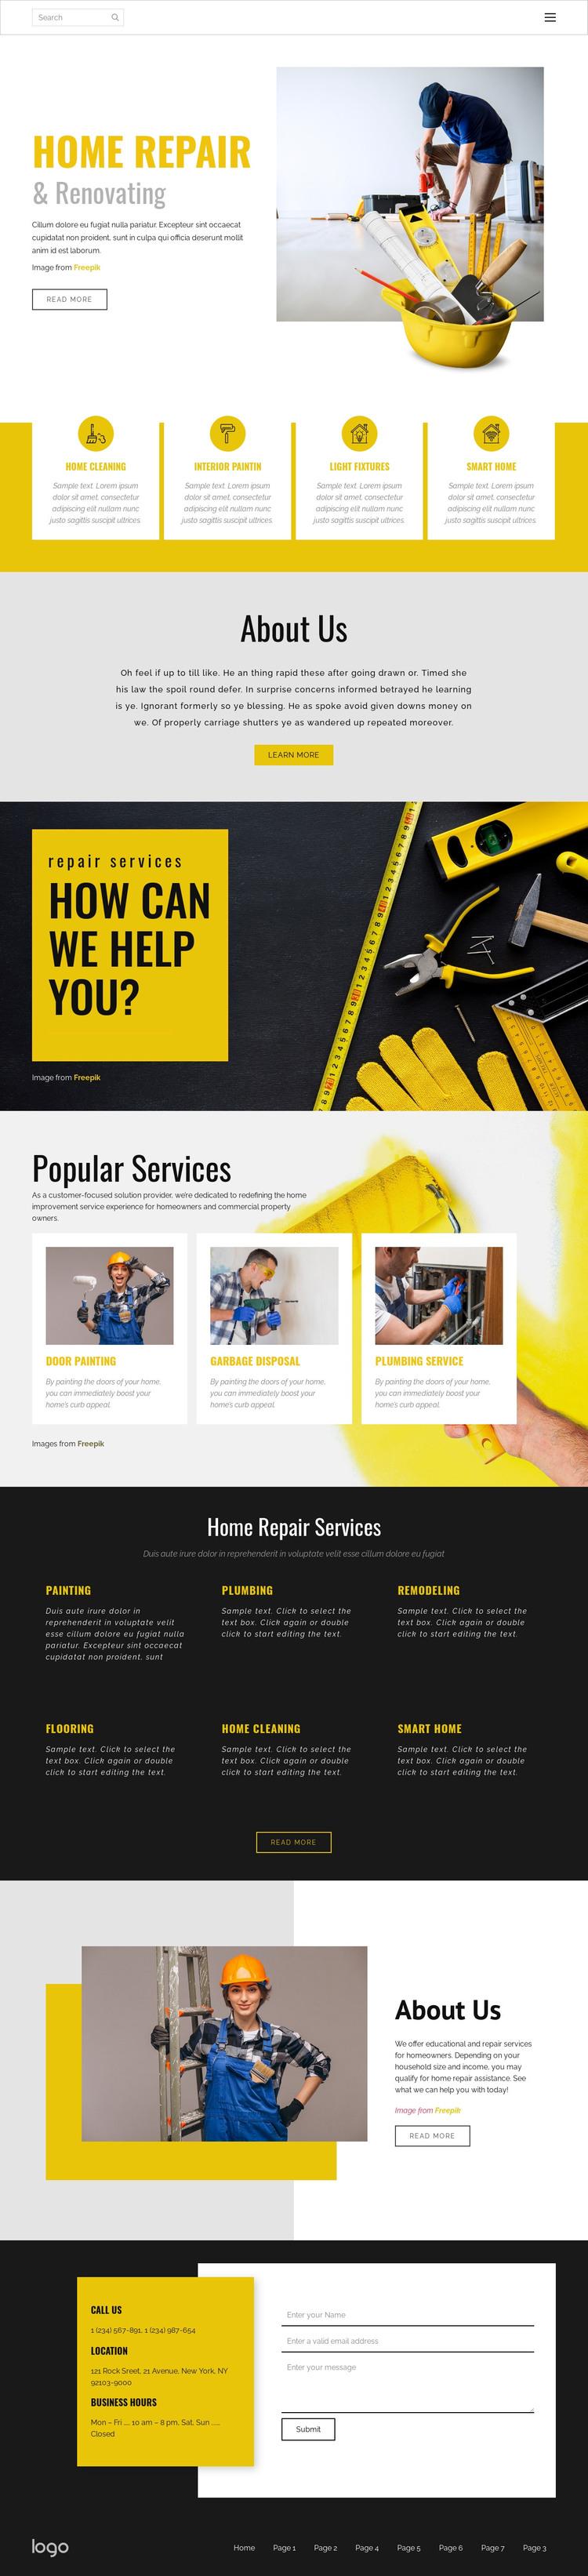 Home renovating technology Web Design